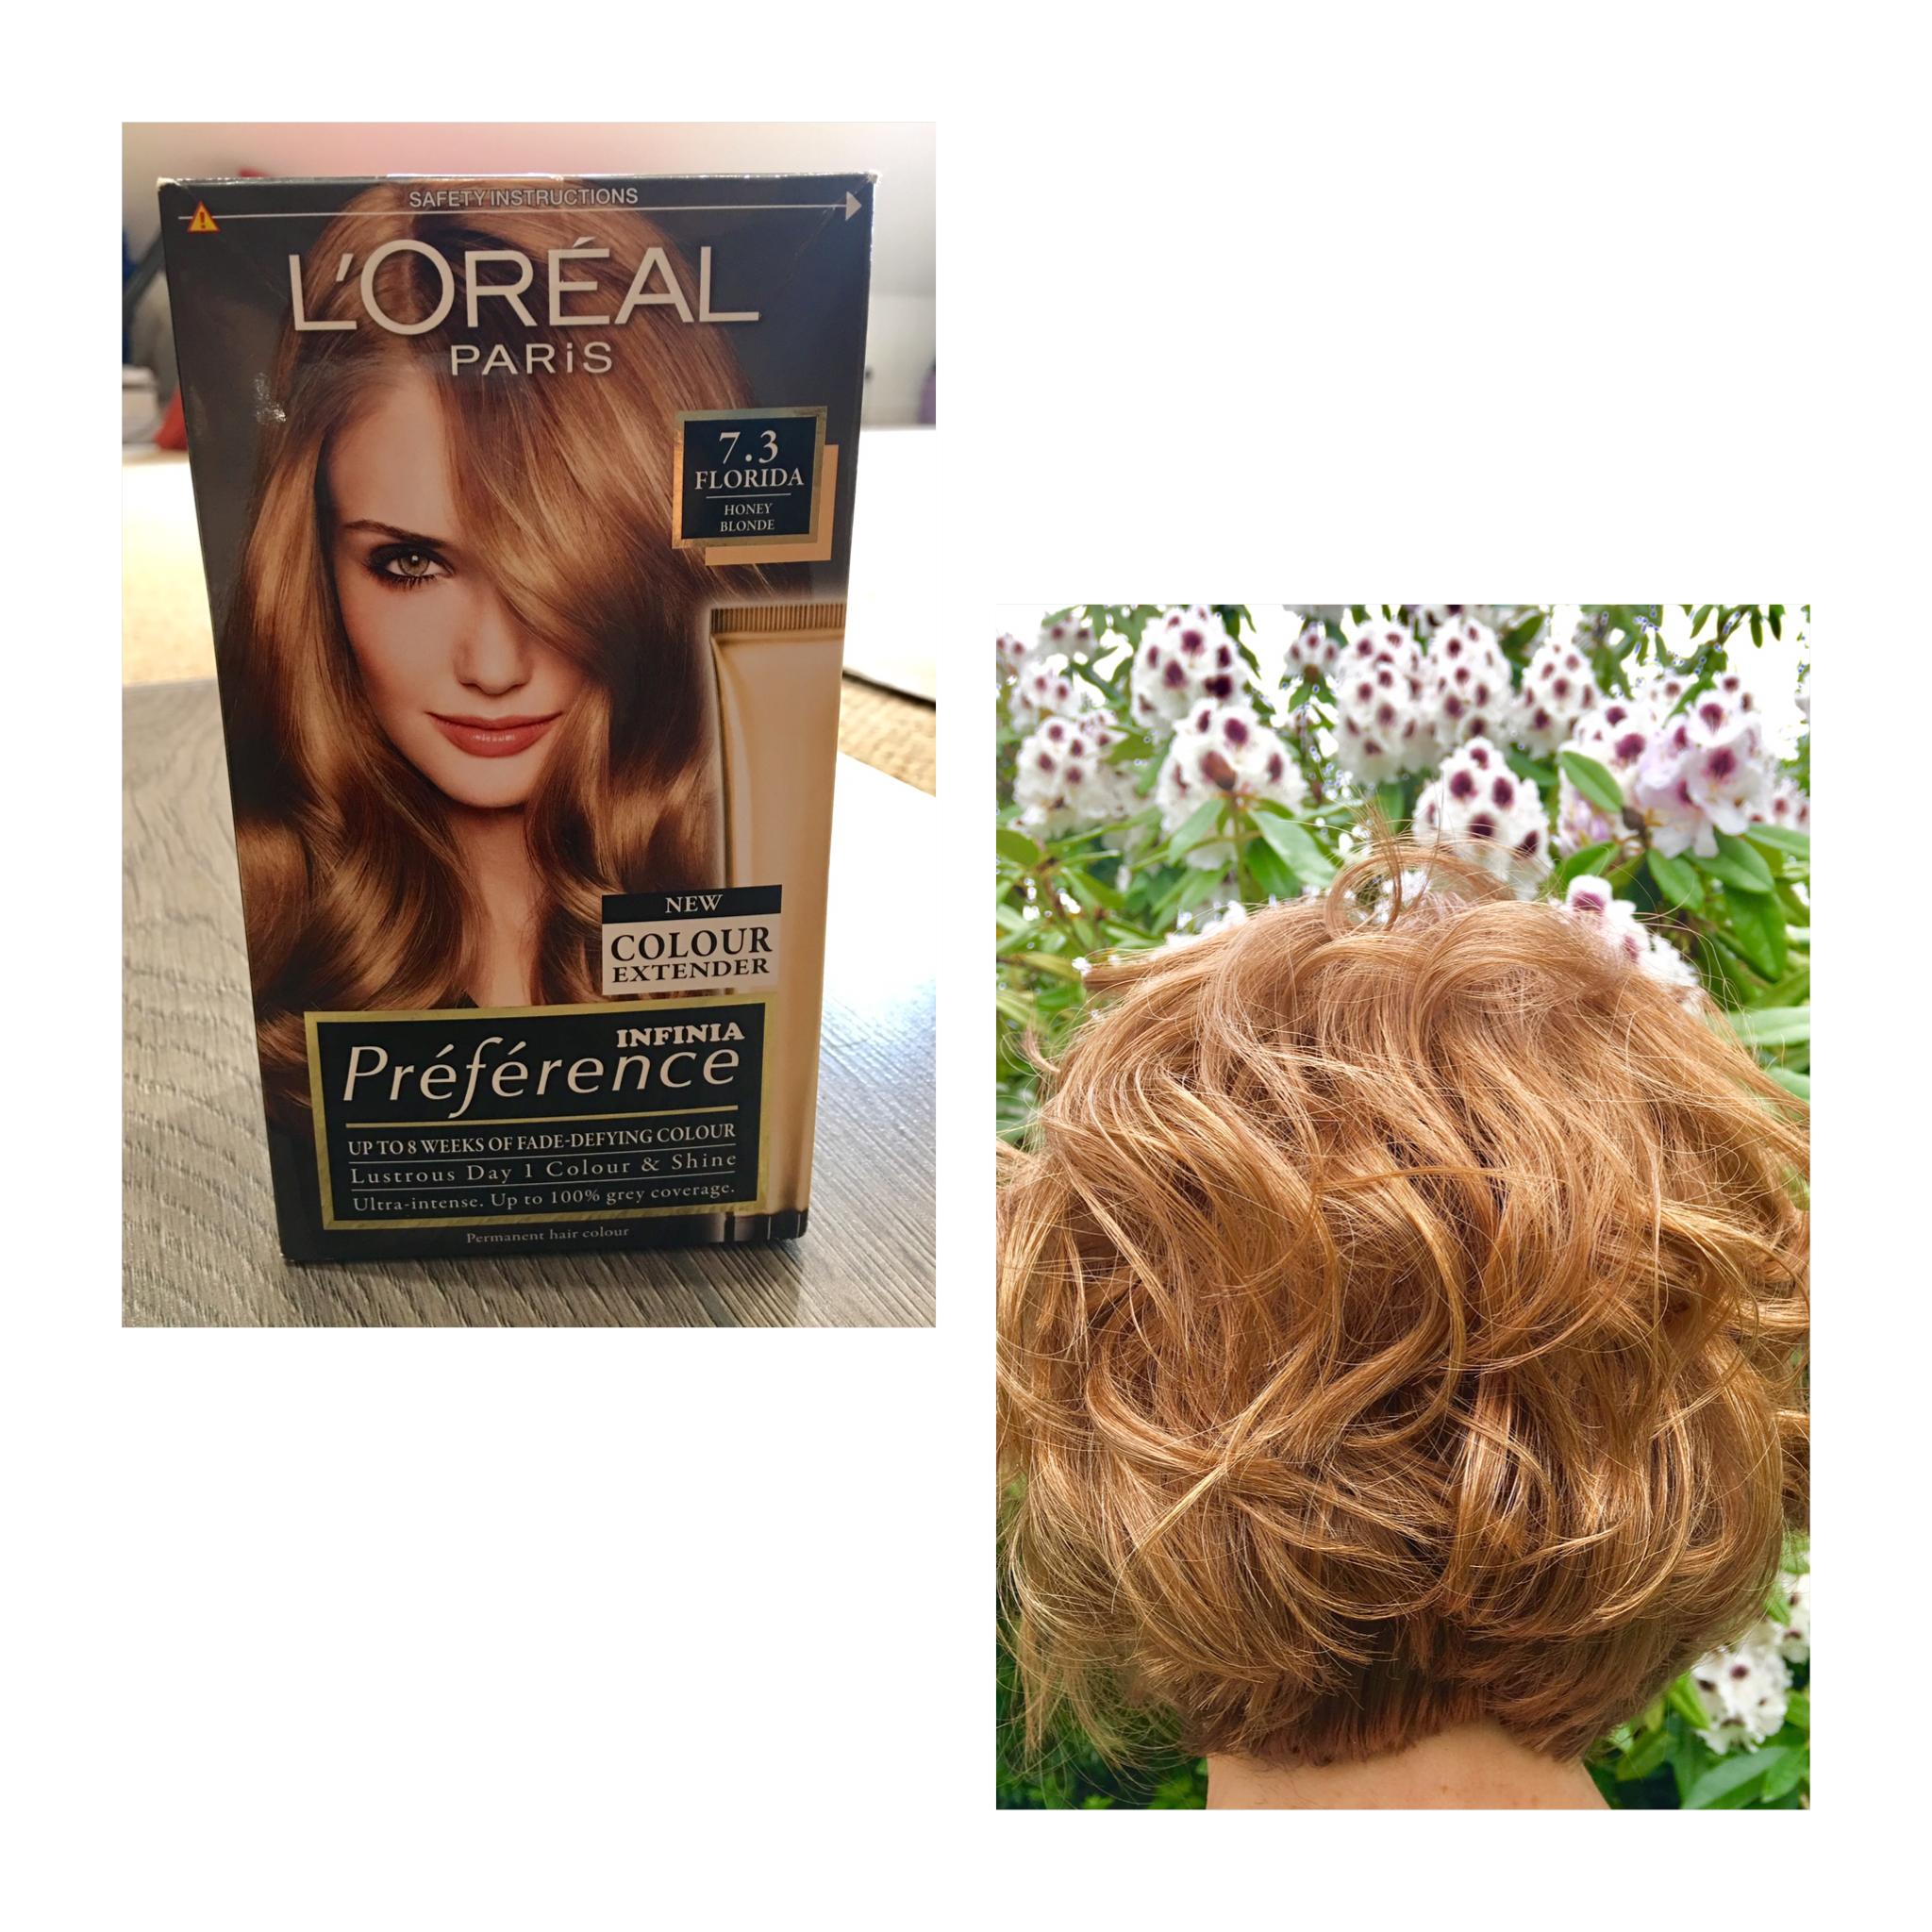 L Oreal Paris Honey Blonde Shiny Glossy Colour At Home Hair Color Loreal Paris Honey Blonde